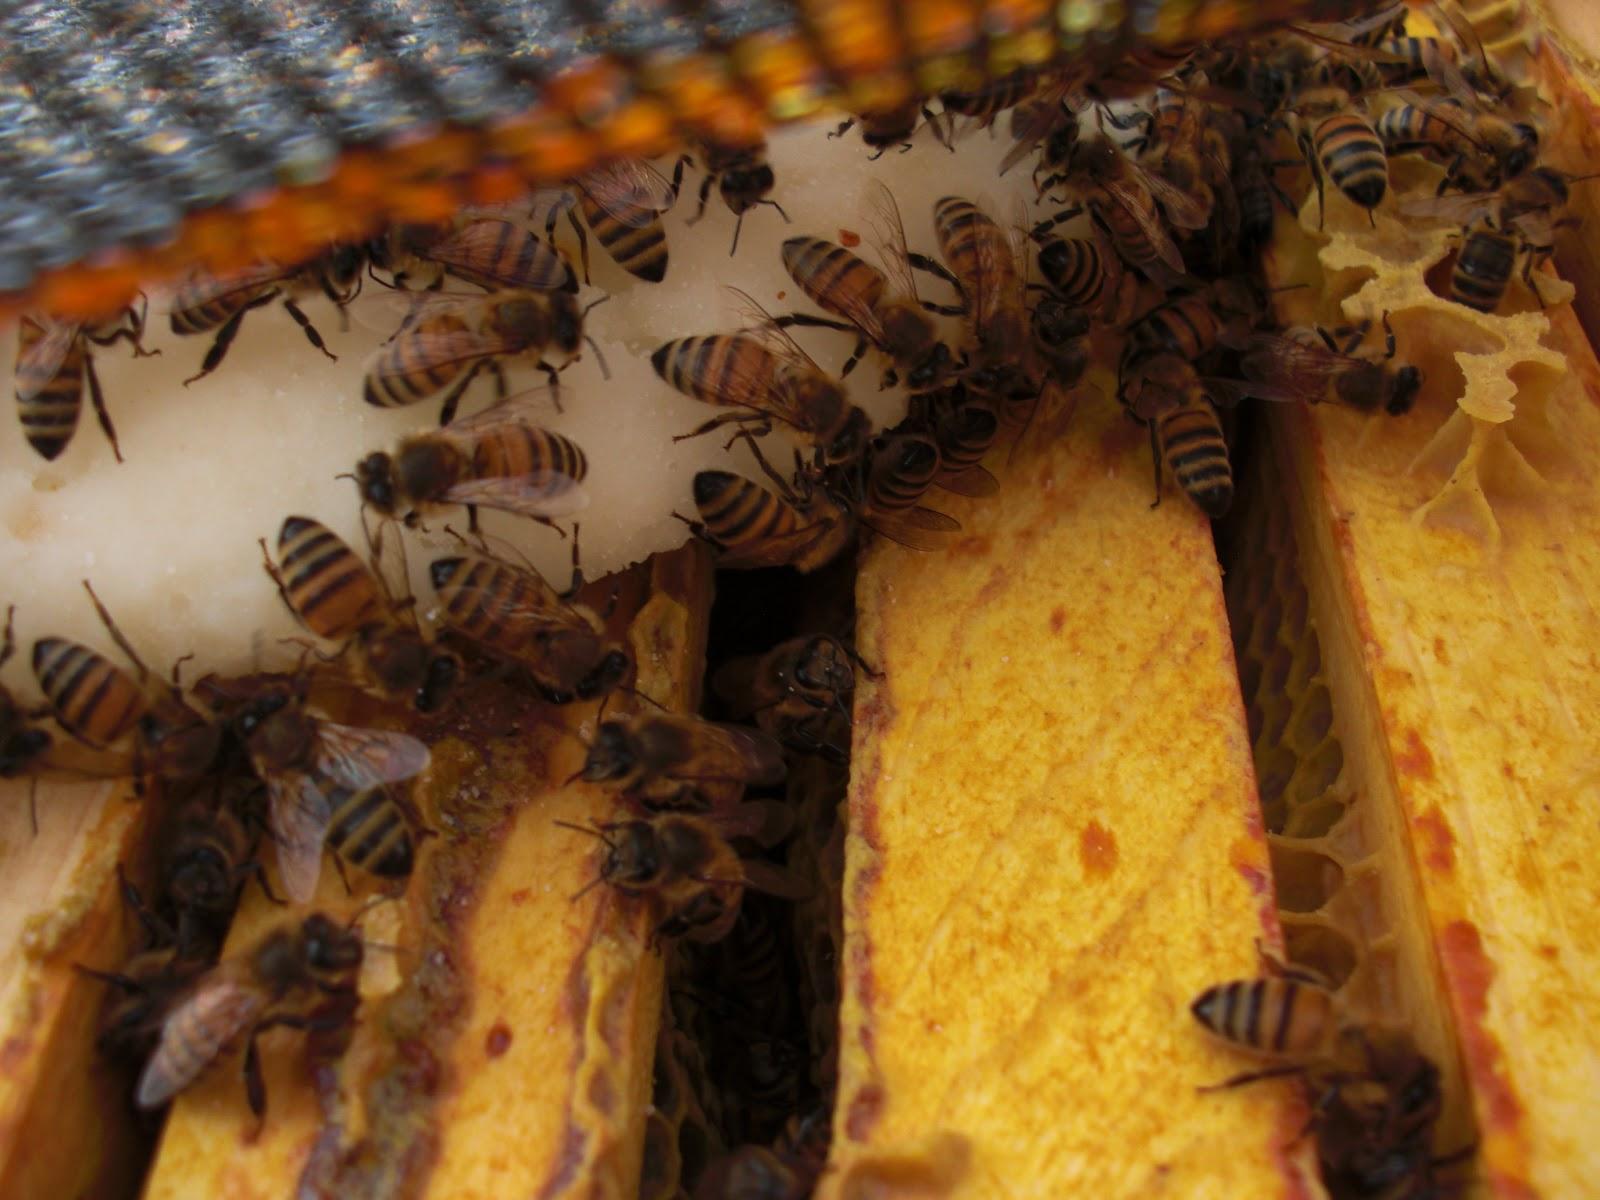 backyard bee hive blog october 2012